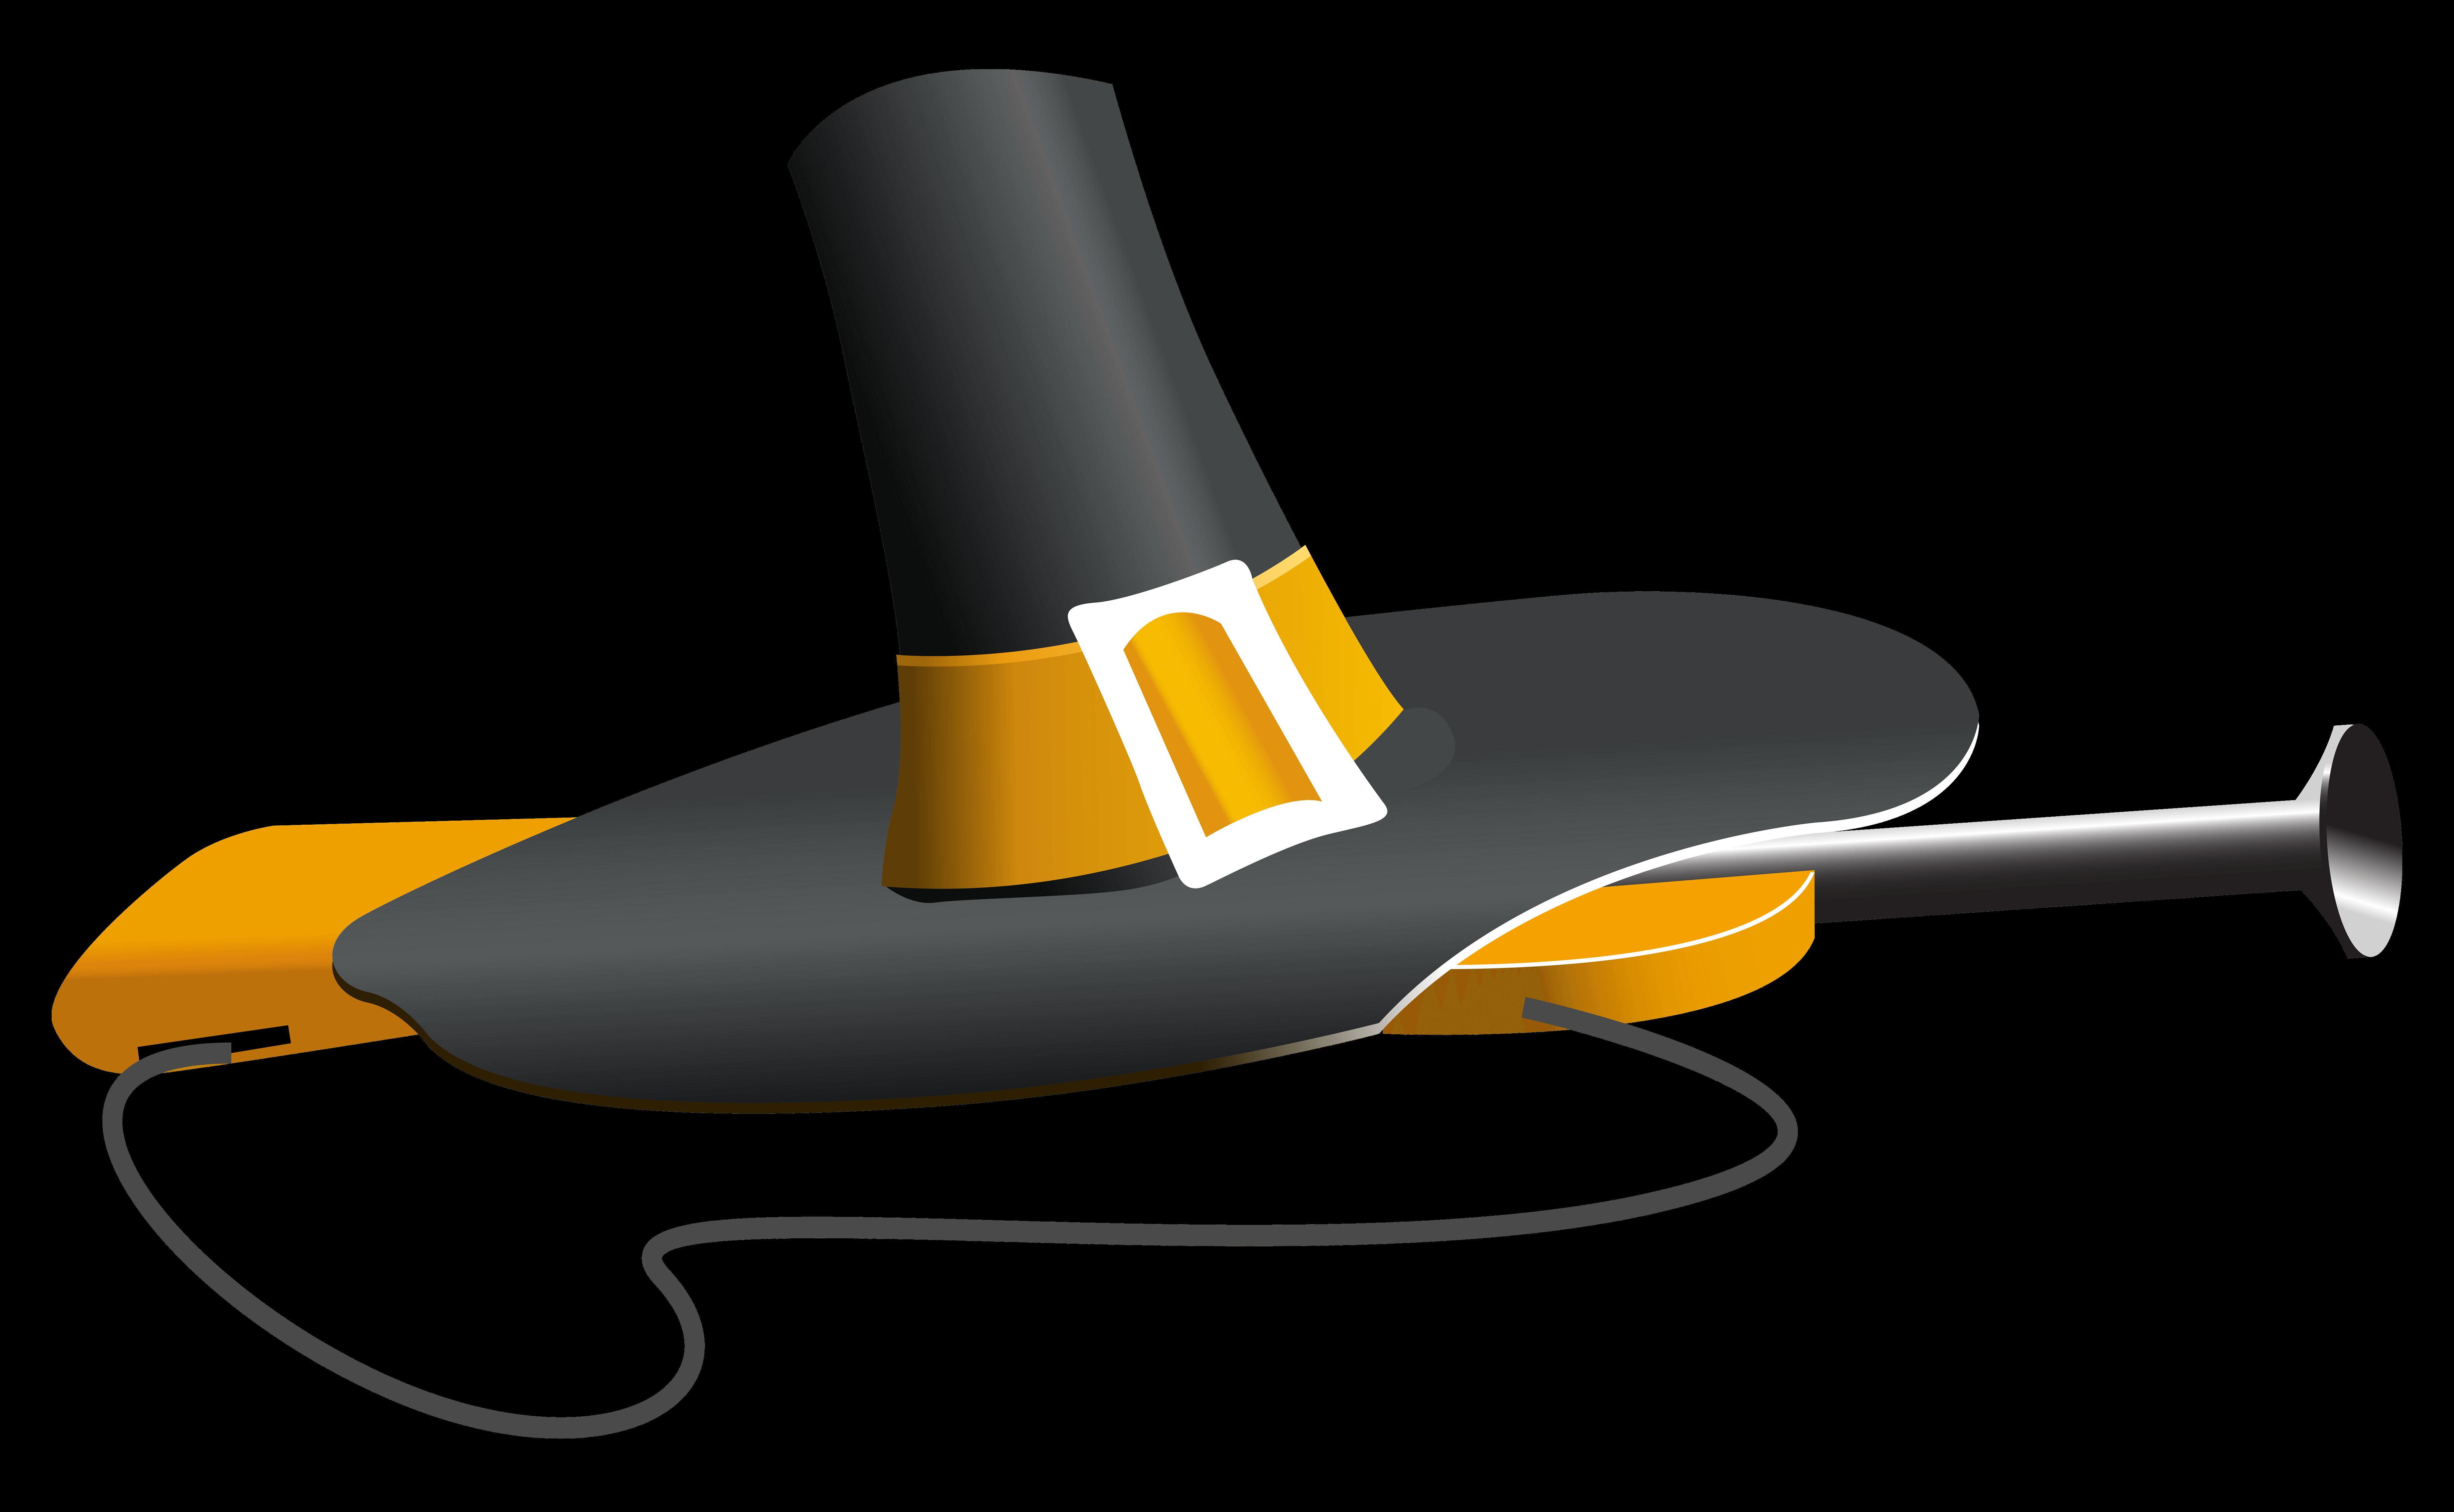 Clipart gun musket. Cliparts zone pilgrim hat